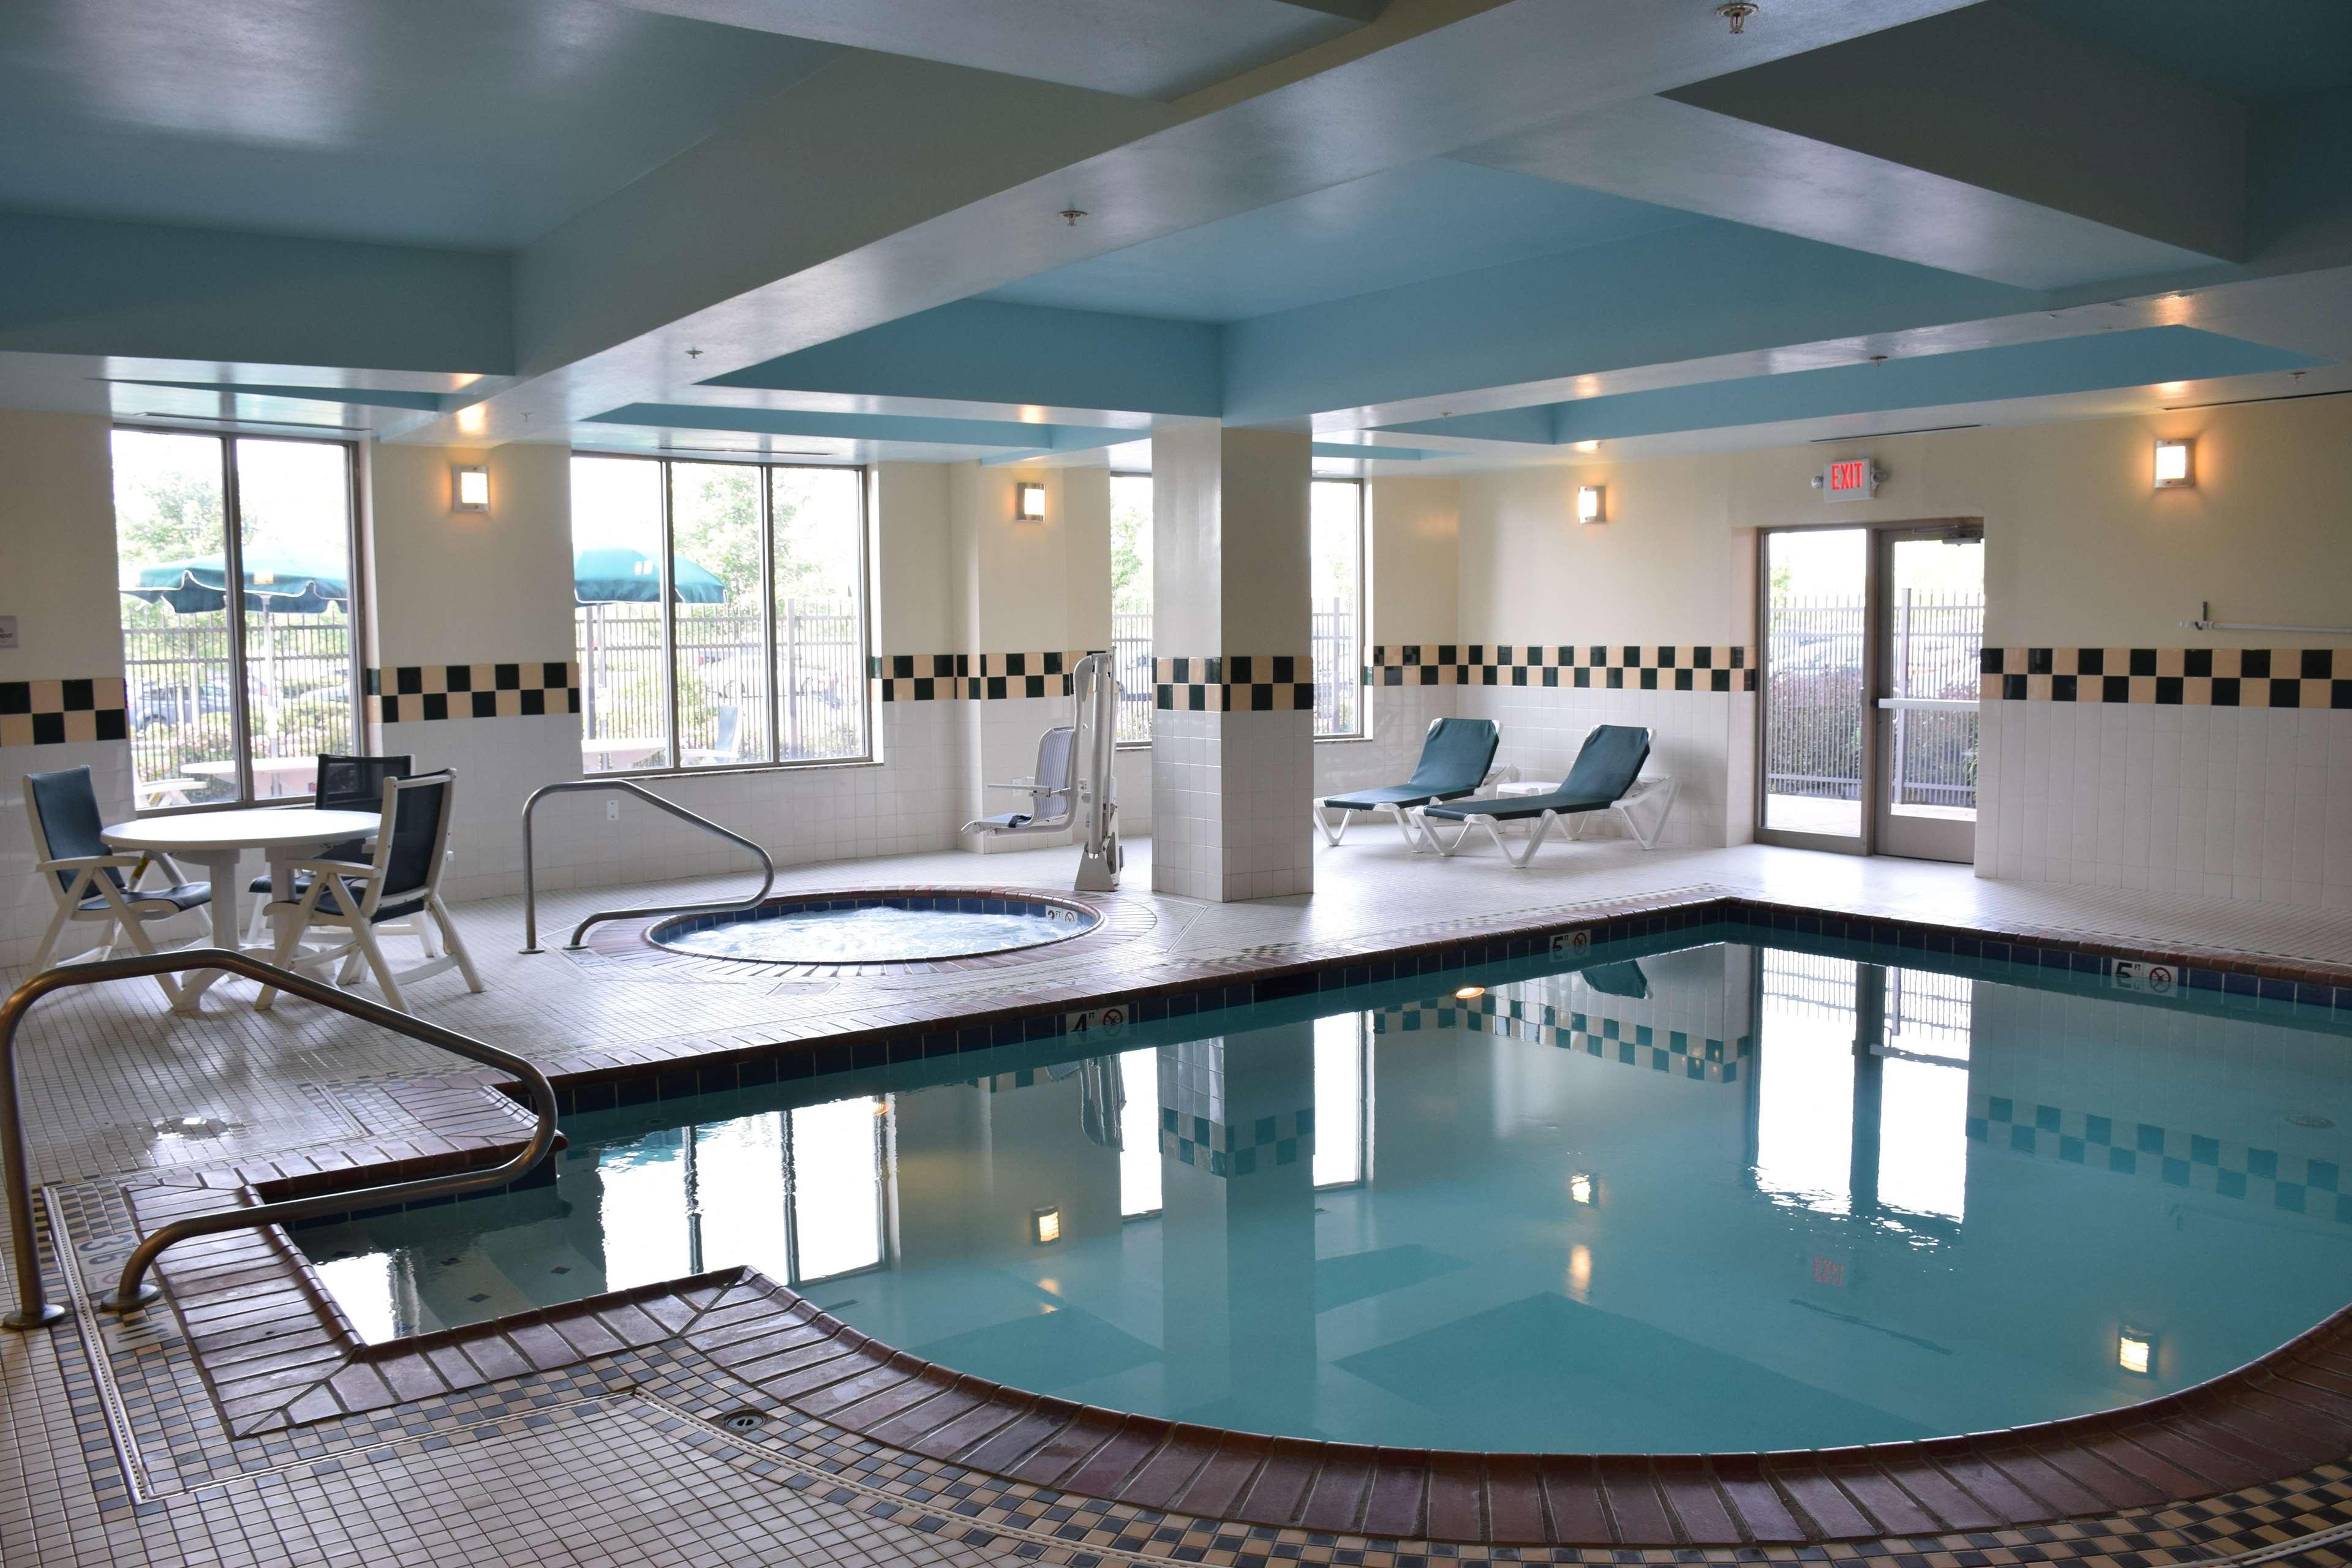 Hilton Garden Inn Dayton Beavercreek image 5